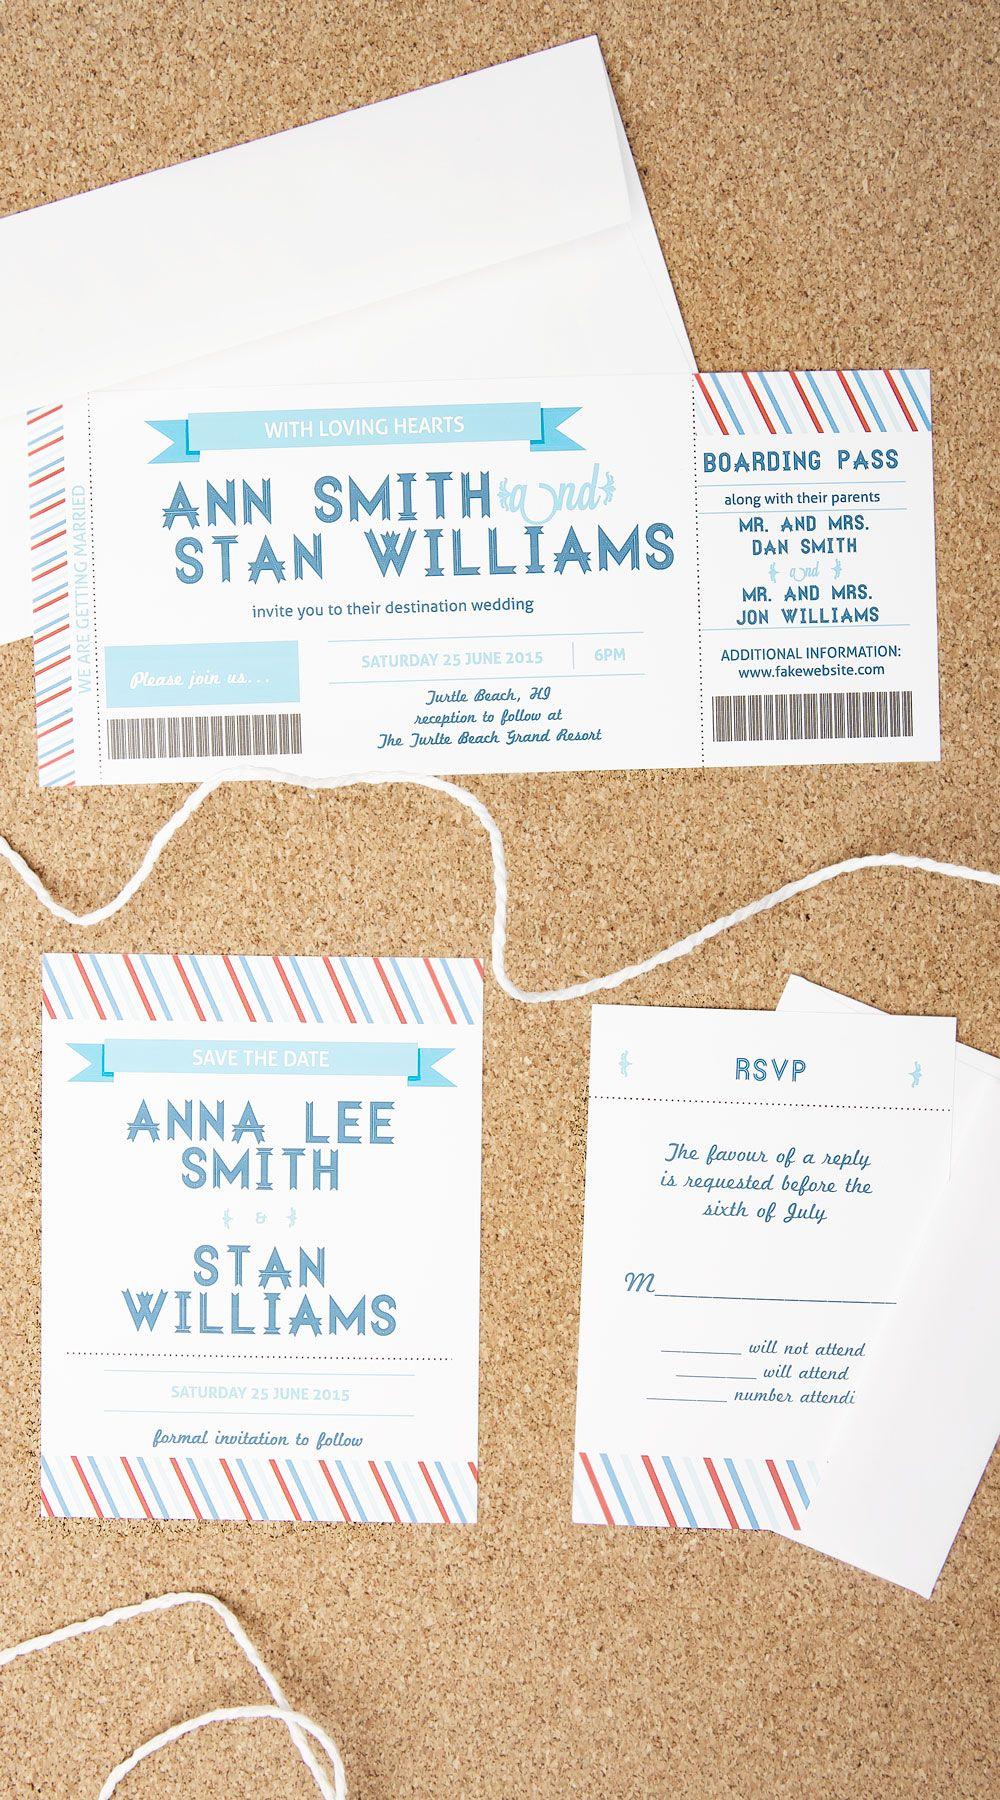 Boarding Pass Wedding Invitations | Wedding | Pinterest | Boarding ...